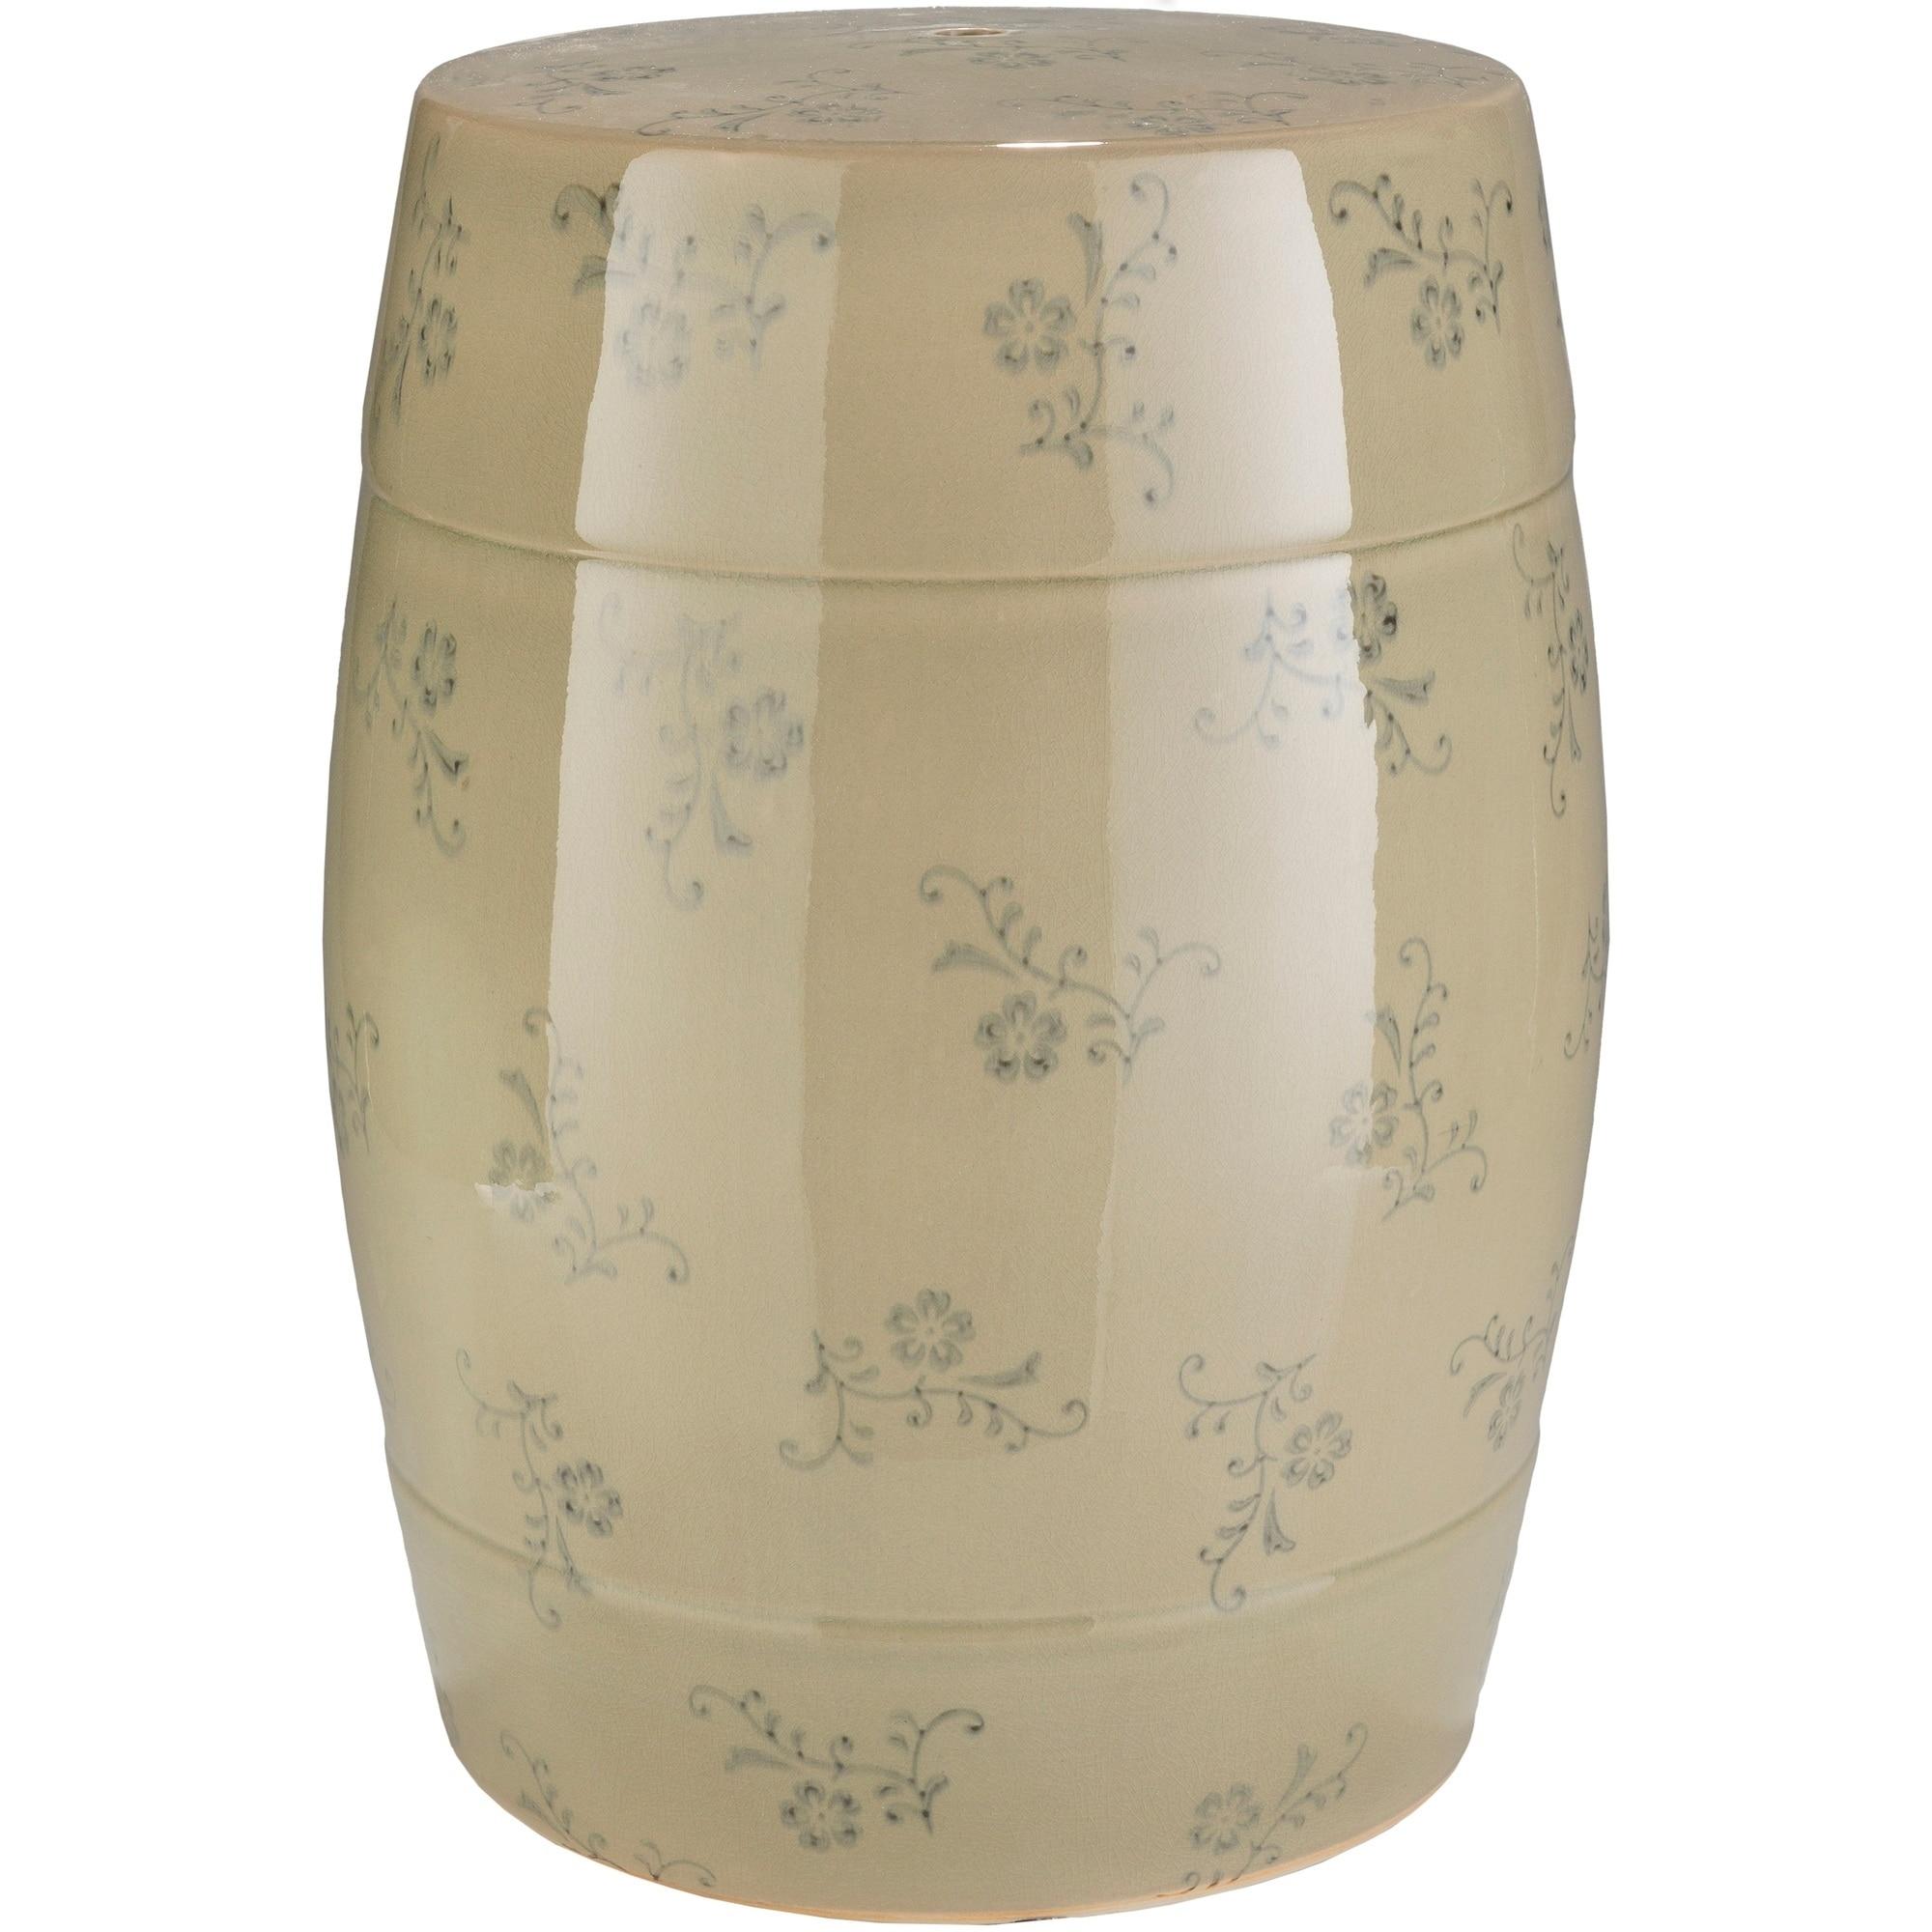 Roland Khaki Transitional Ceramic Stool, Tan, Size Single...